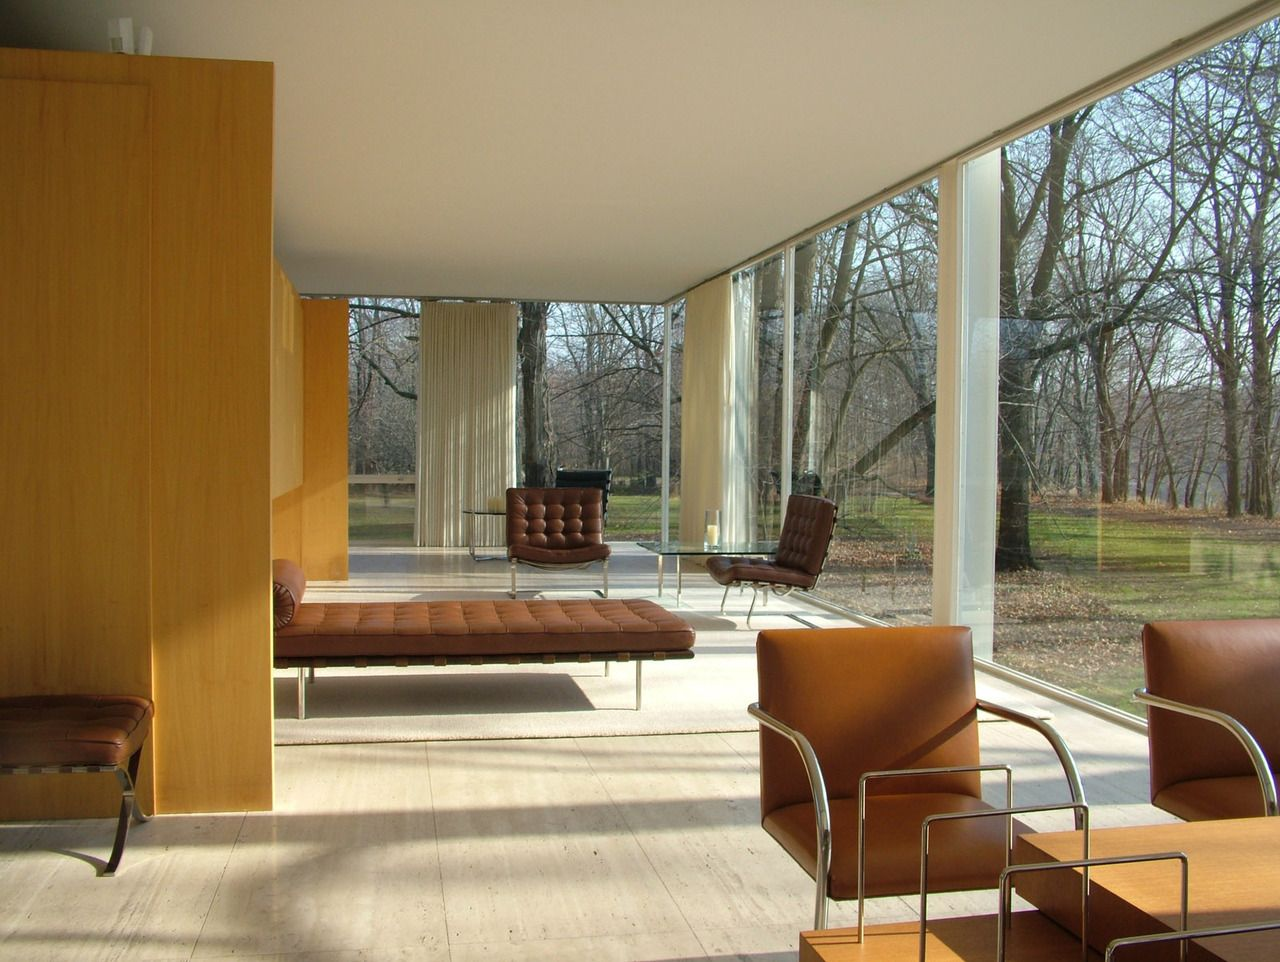 Ludwig mies van der rohe 1886 1969 edith farnsworth residence plano illinois 1946 1951